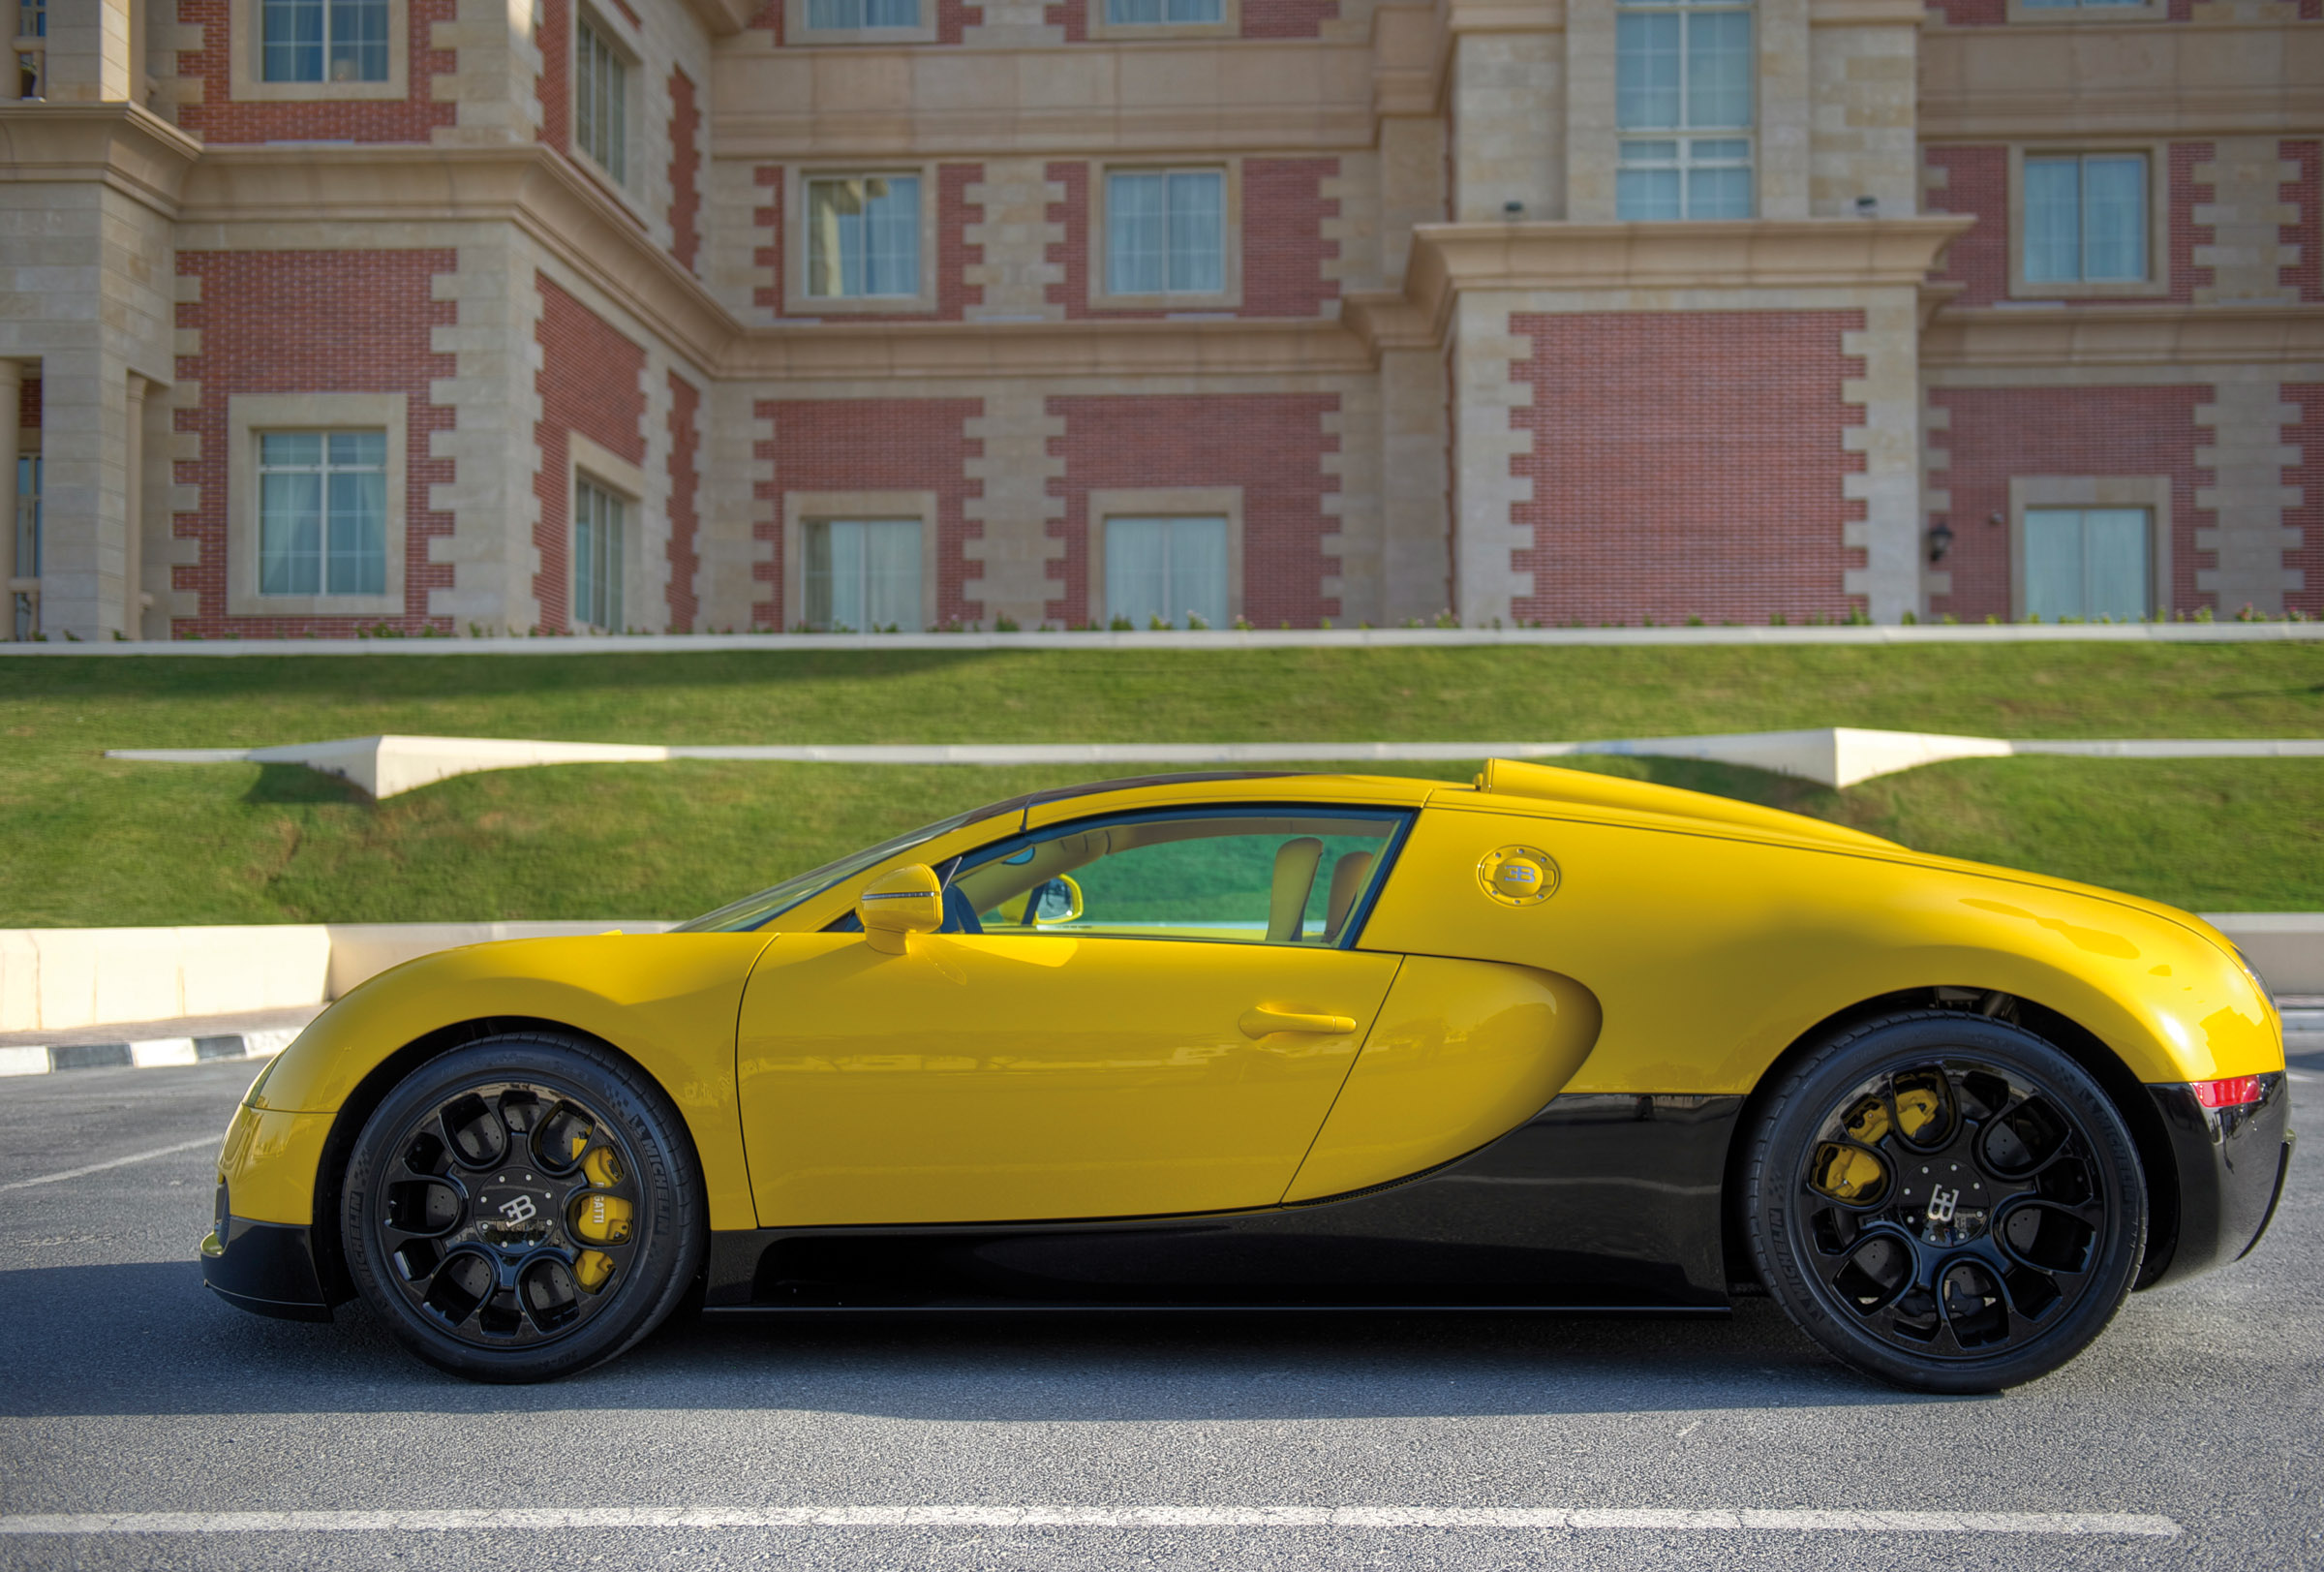 bugatti-veyron-16-4-grand-sport-qatar-2012-05 Fabulous 2012 Bugatti Veyron Grand Sport Vitesse Specs Cars Trend